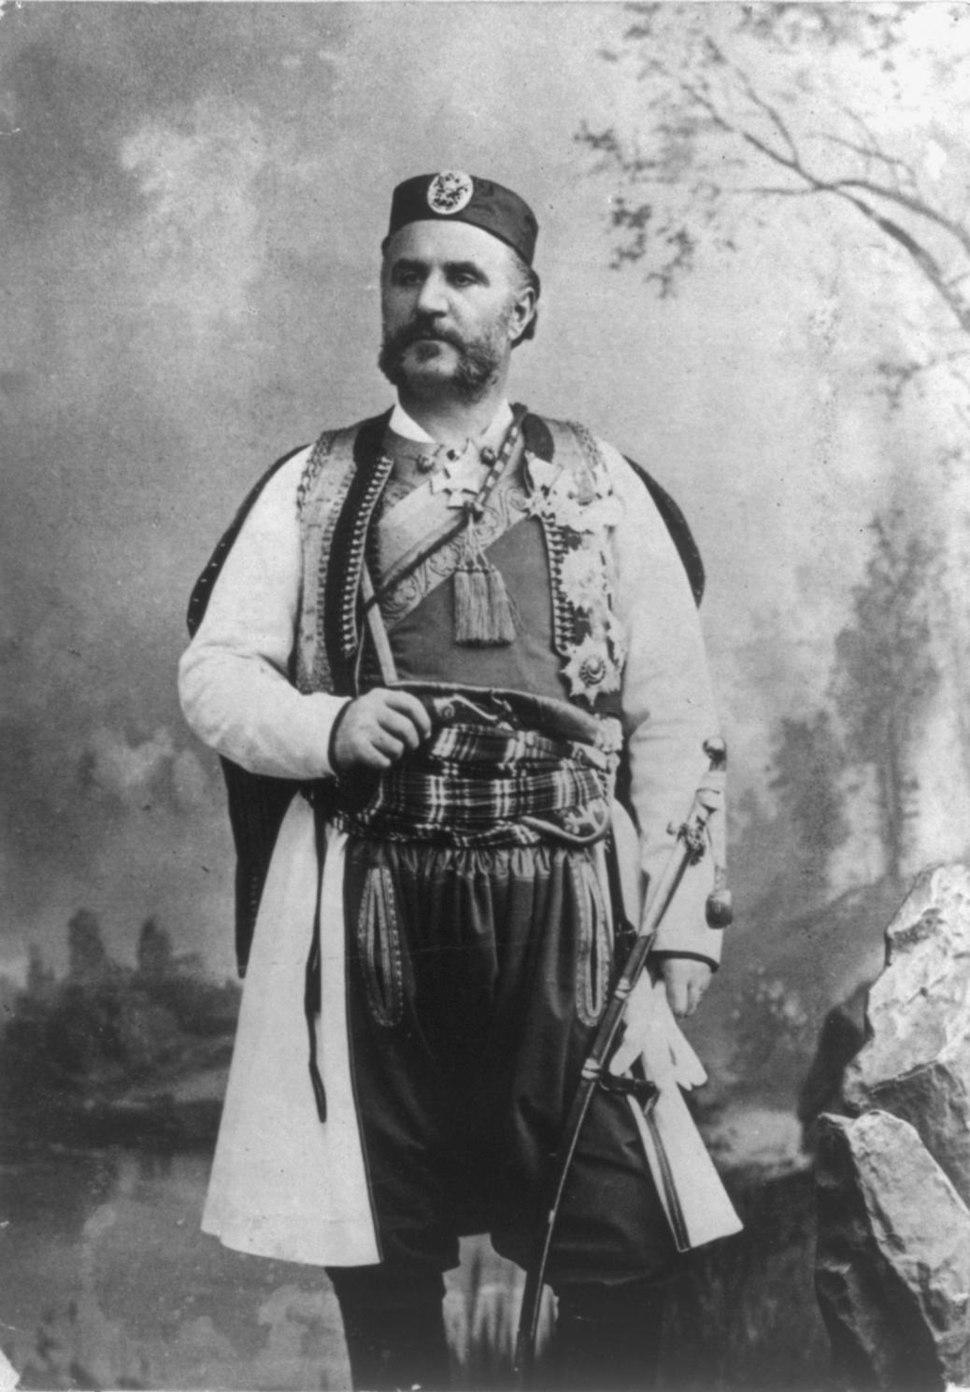 Nicholas I of Montenegro, 1909